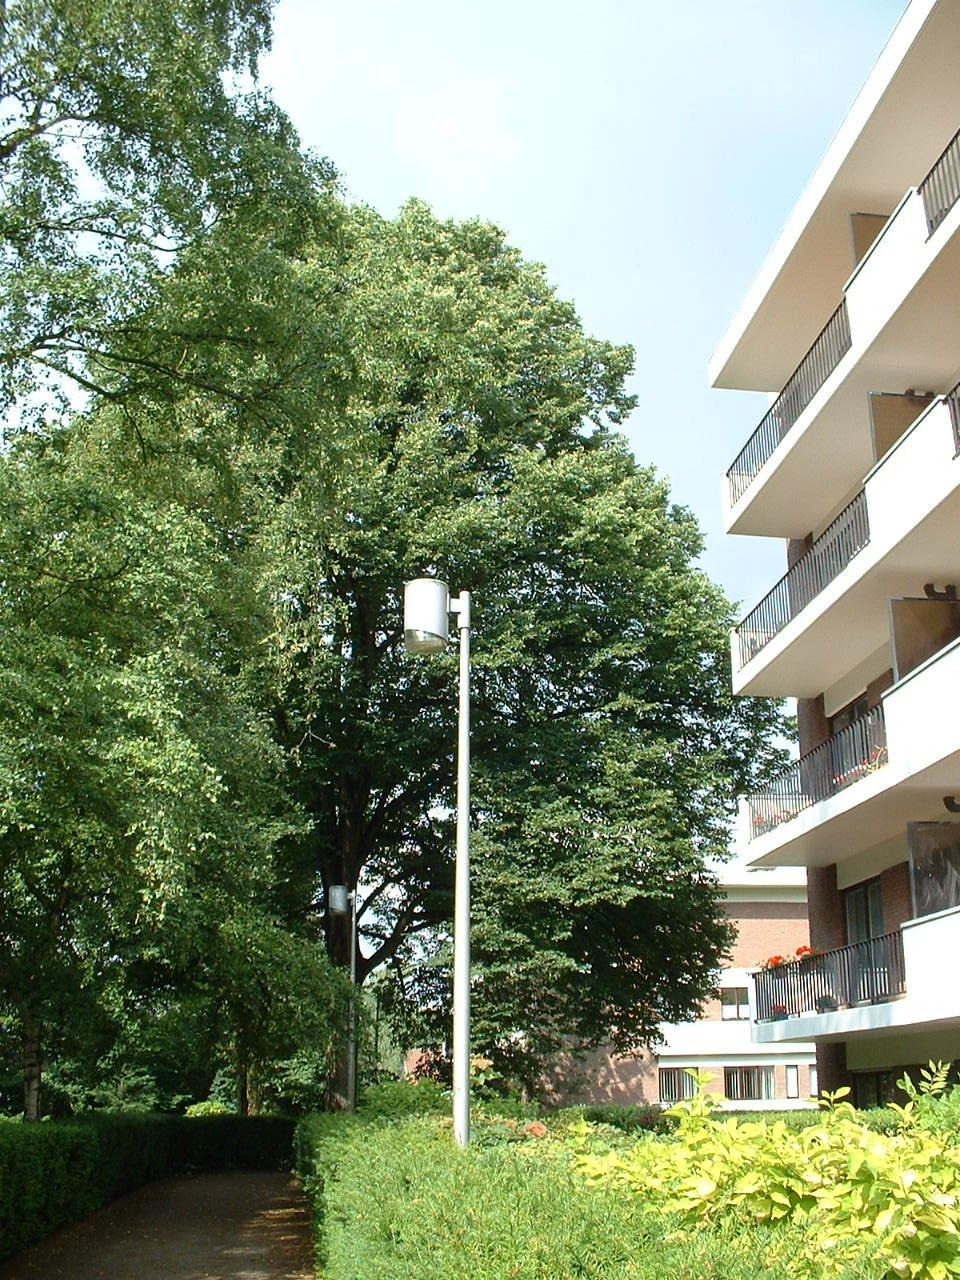 Tilleul à petites feuilles – Watermael-Boitsfort, Avenue Léopold Wiener, 85 –  04 Juillet 2002